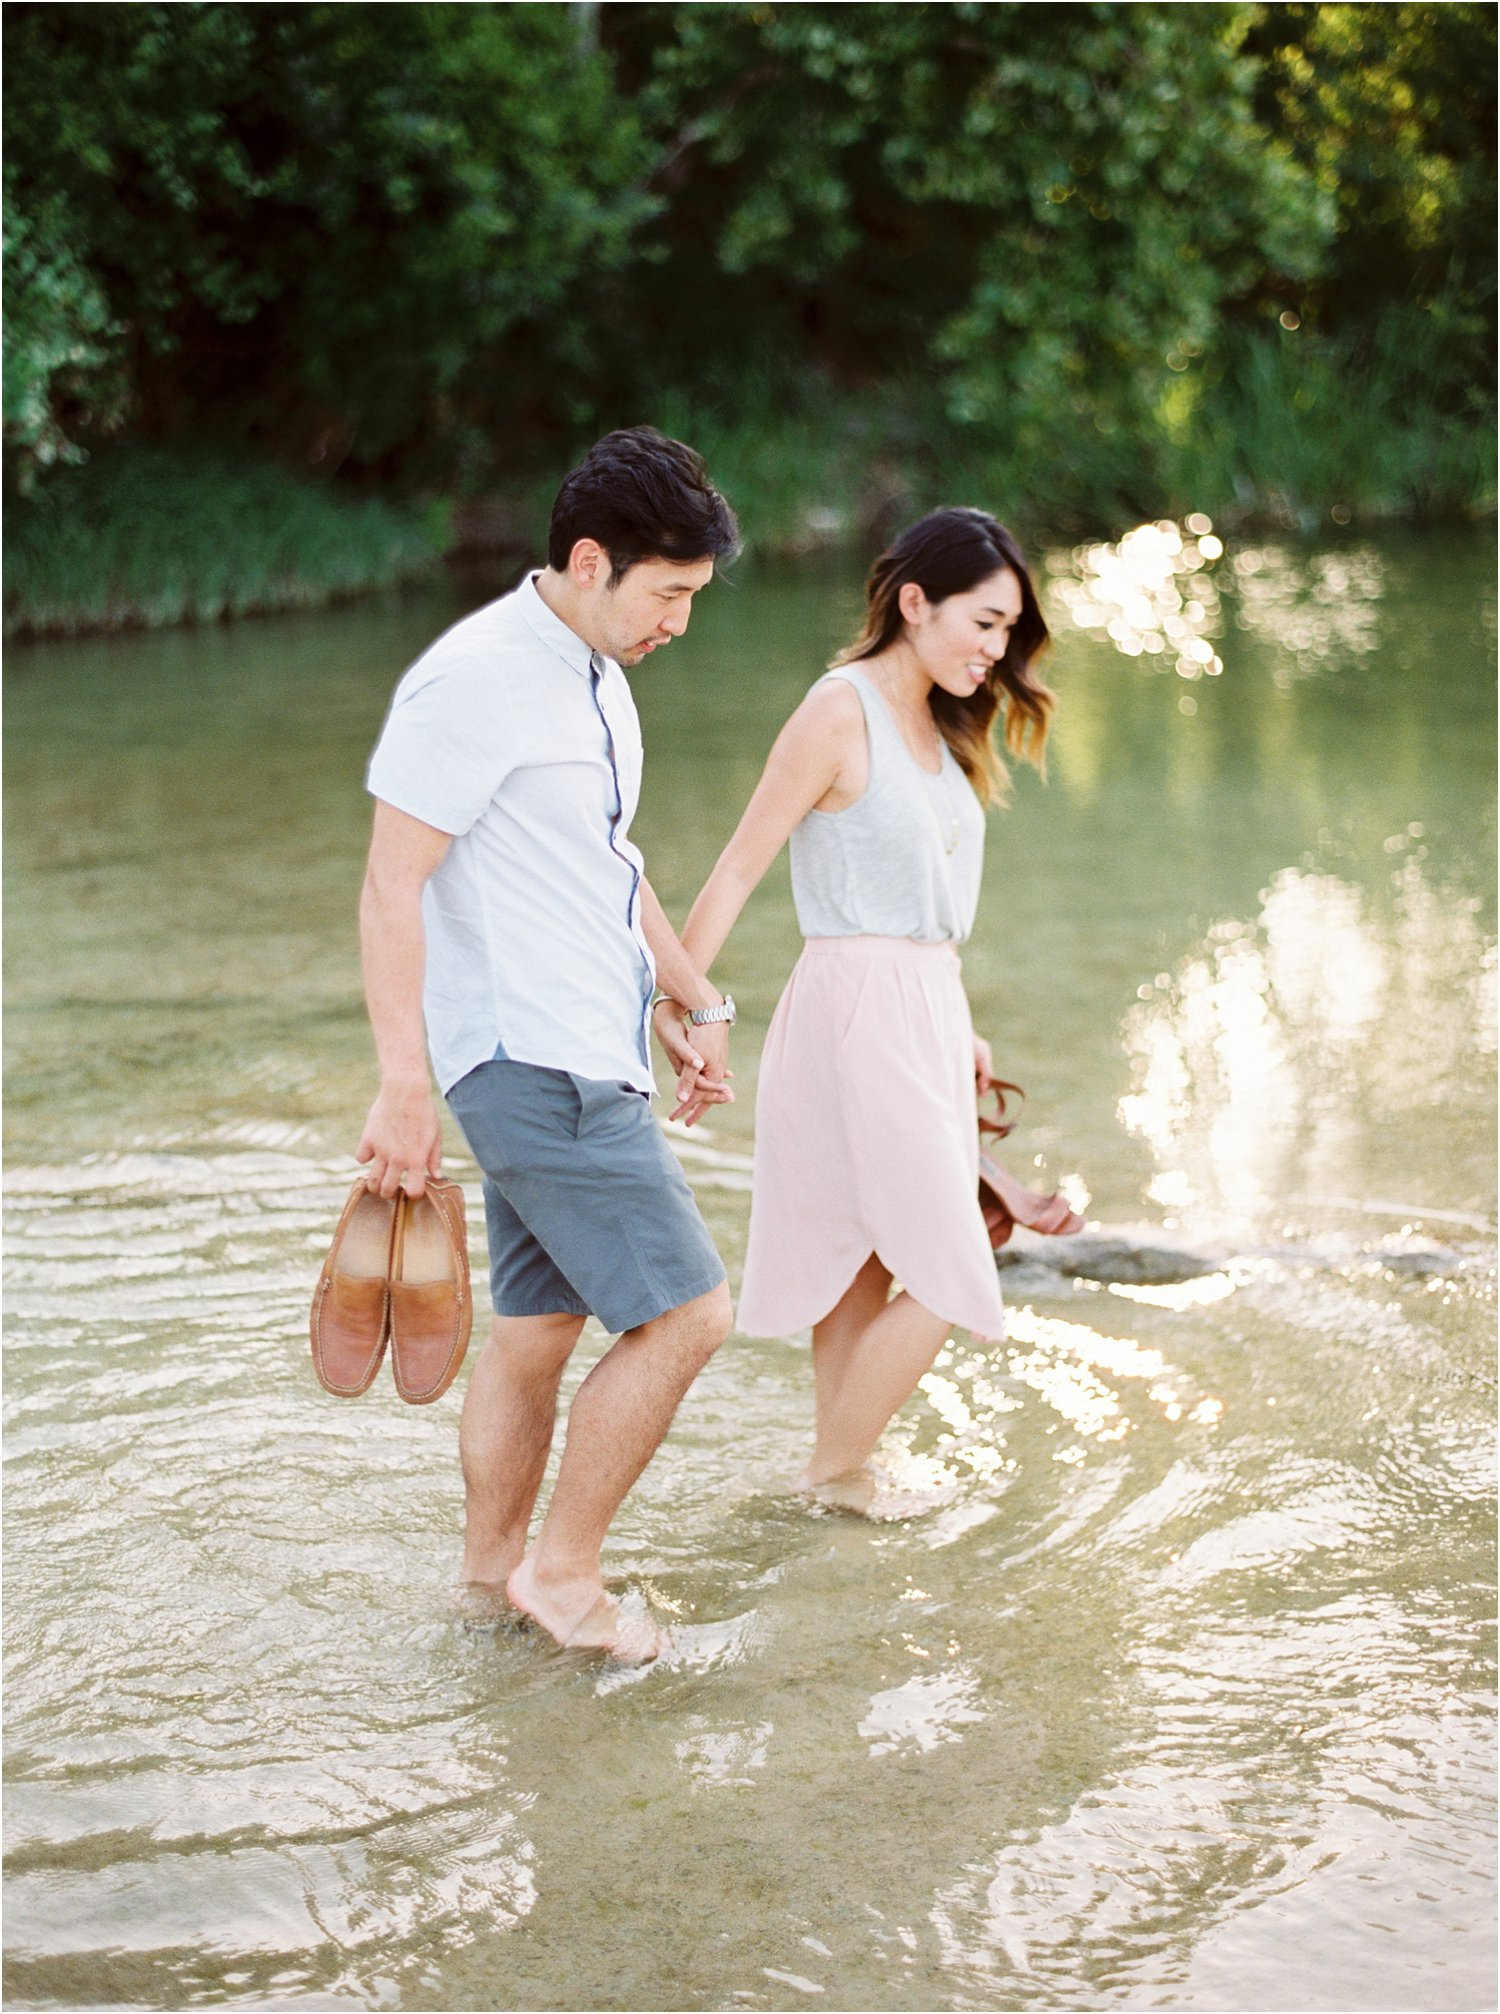 Emily + Philip | Engagement Session | Jessica Scott Photography